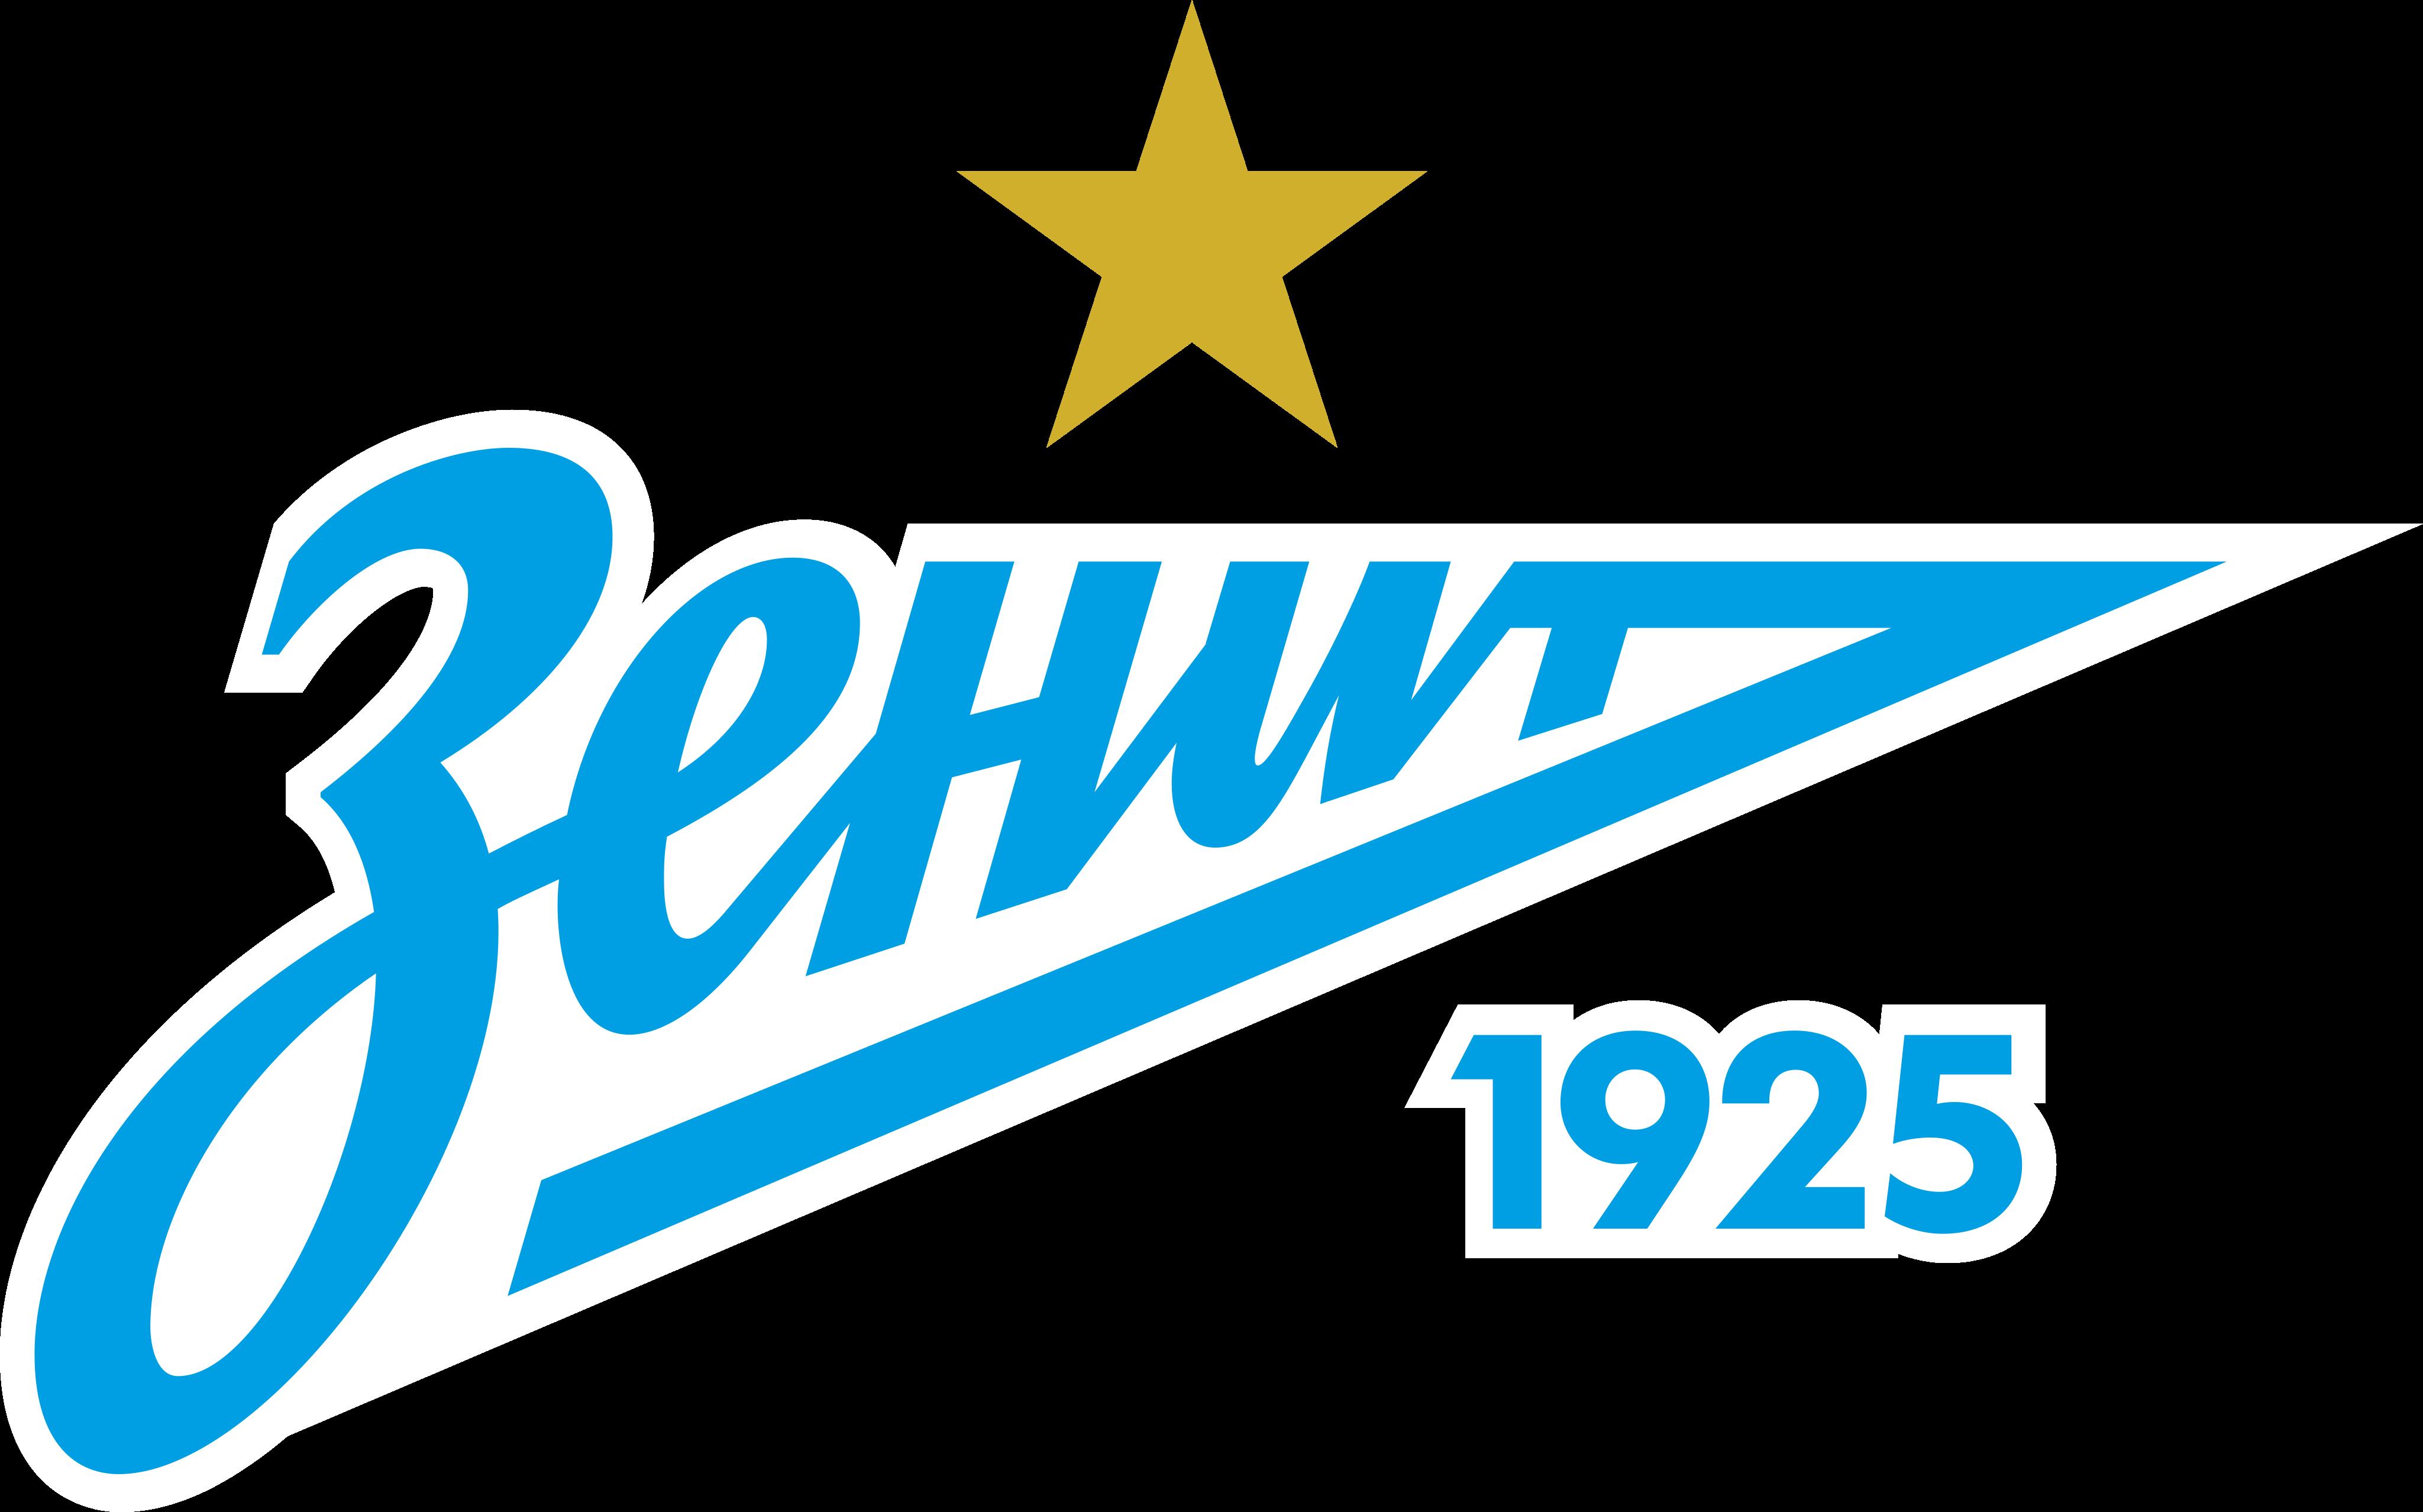 fc zenit logo - FC Zenit Logo - Escudo